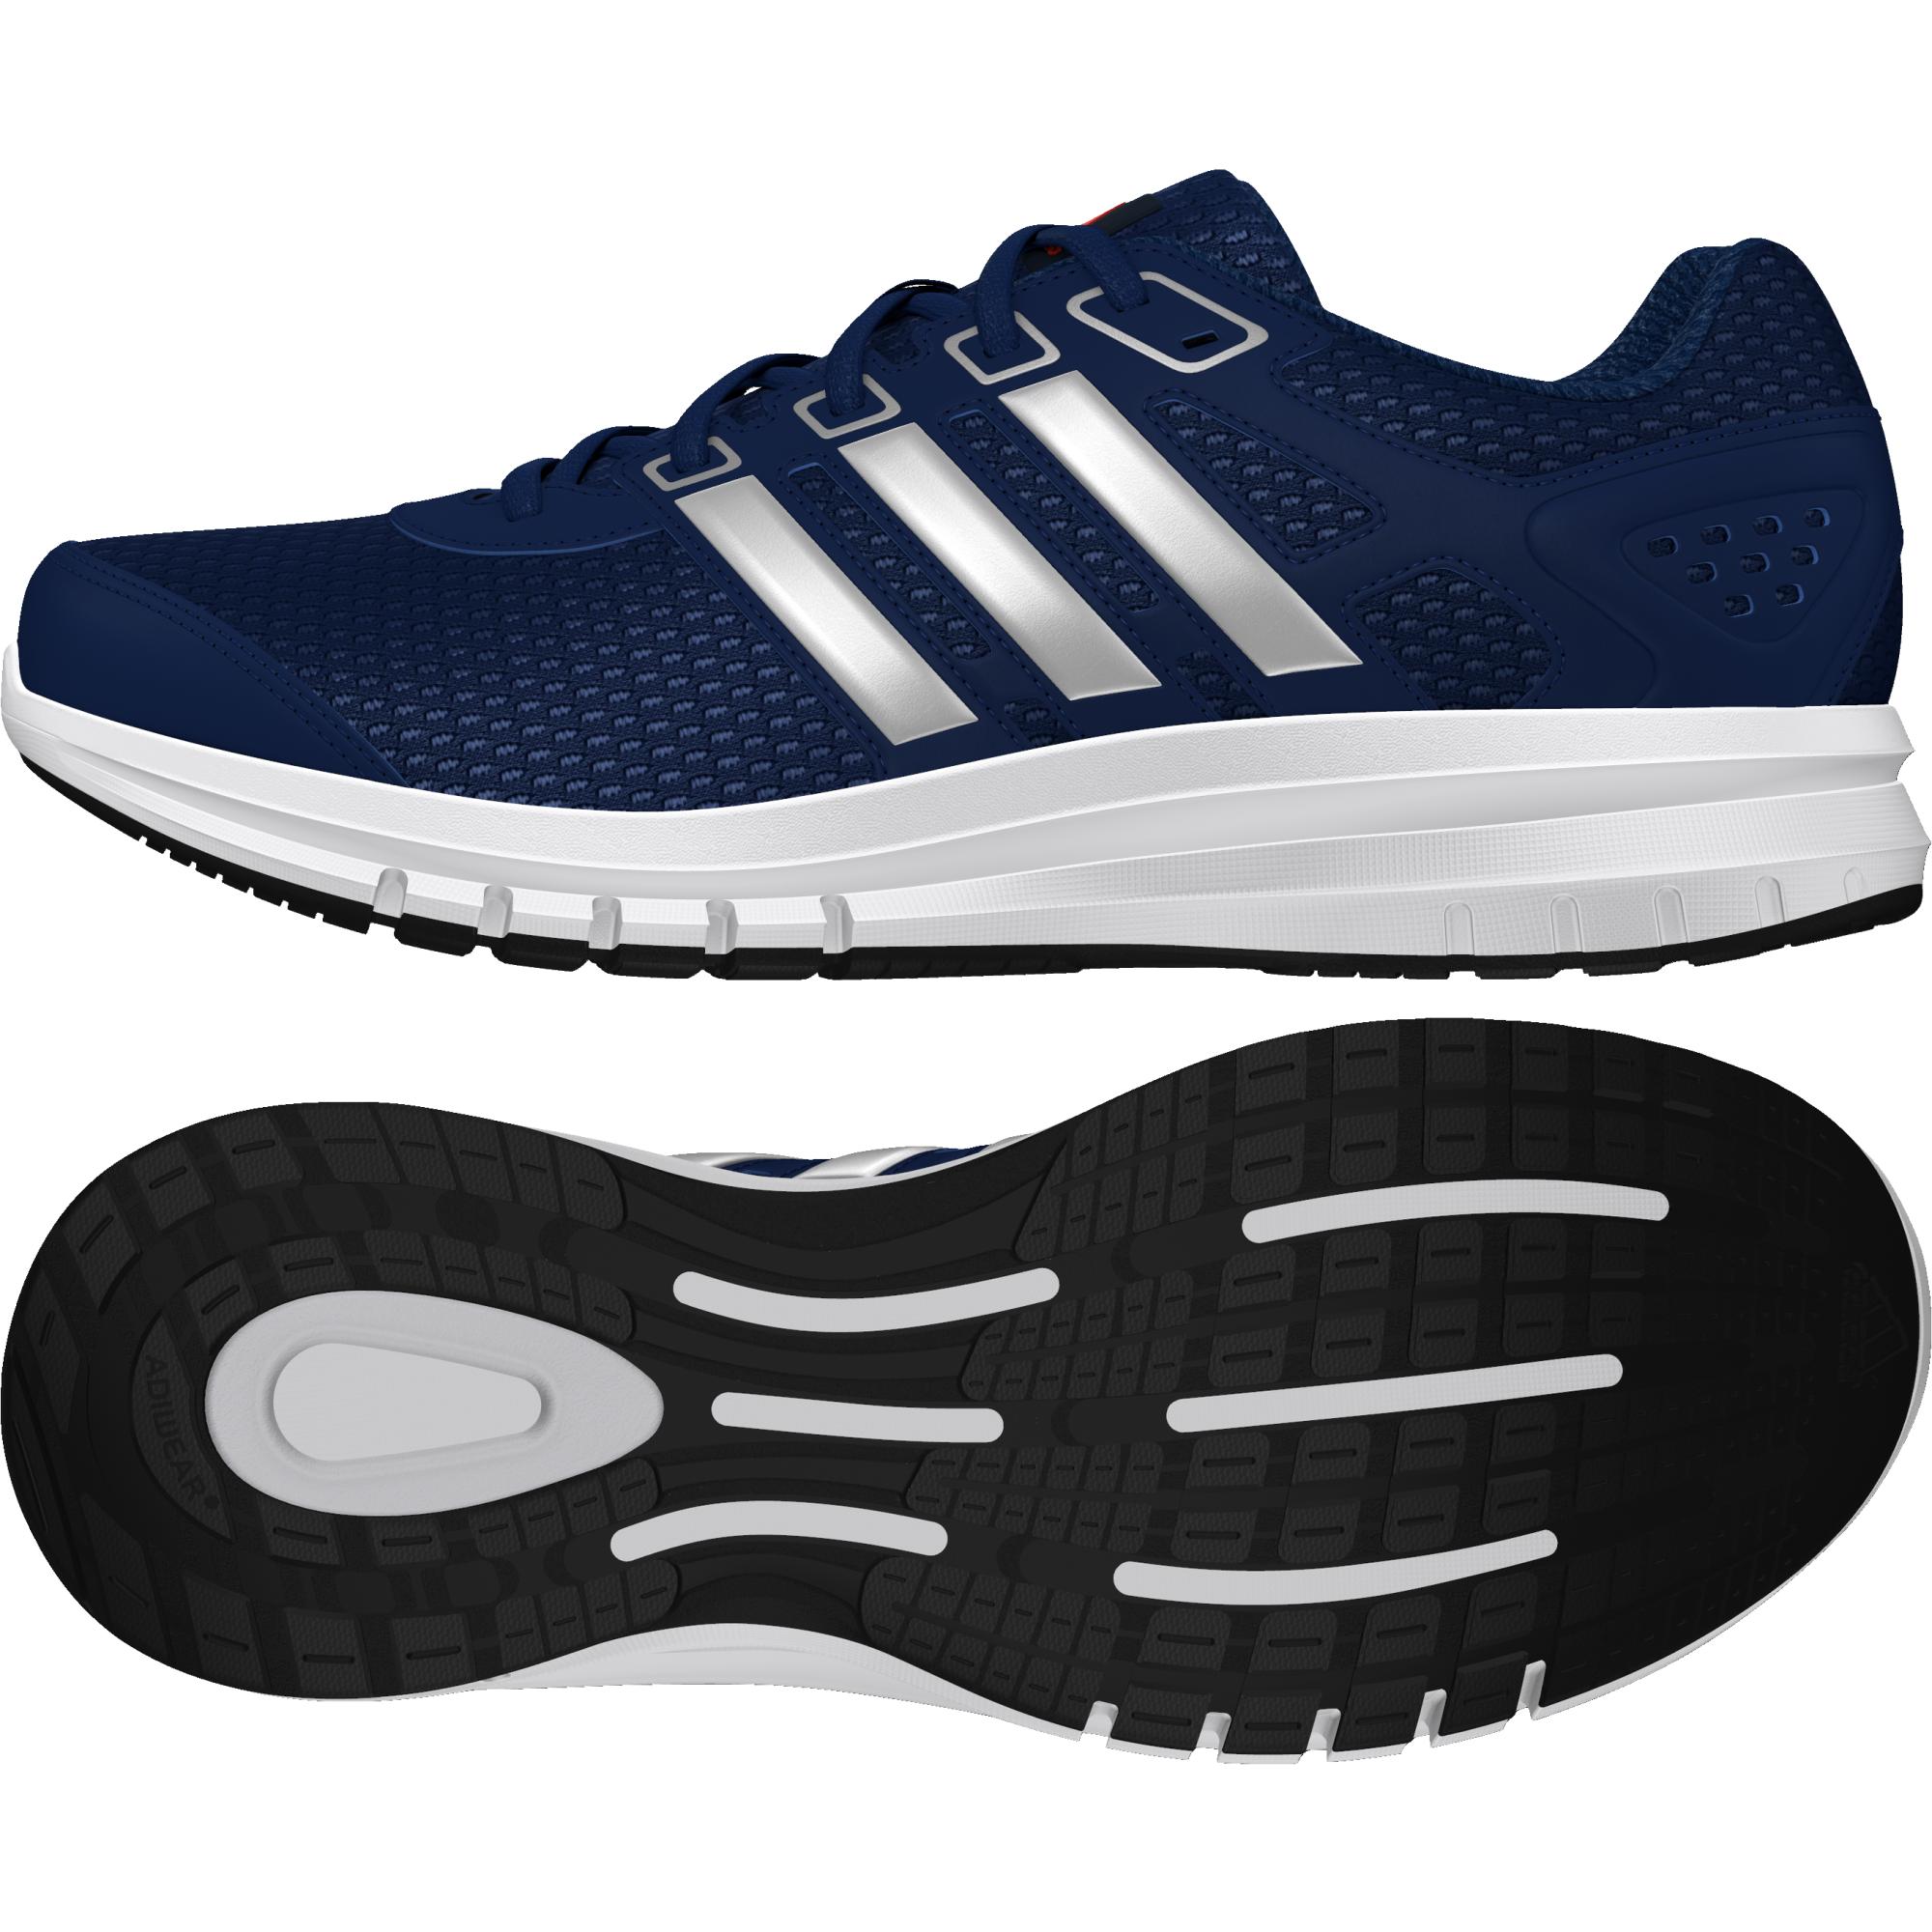 33be24b8ce Adidas Duramo Lite M férfi futócipő , Férfi cipő | futócipő |  adidas_performance | Adidas Duramo Lite M férfi futócipő